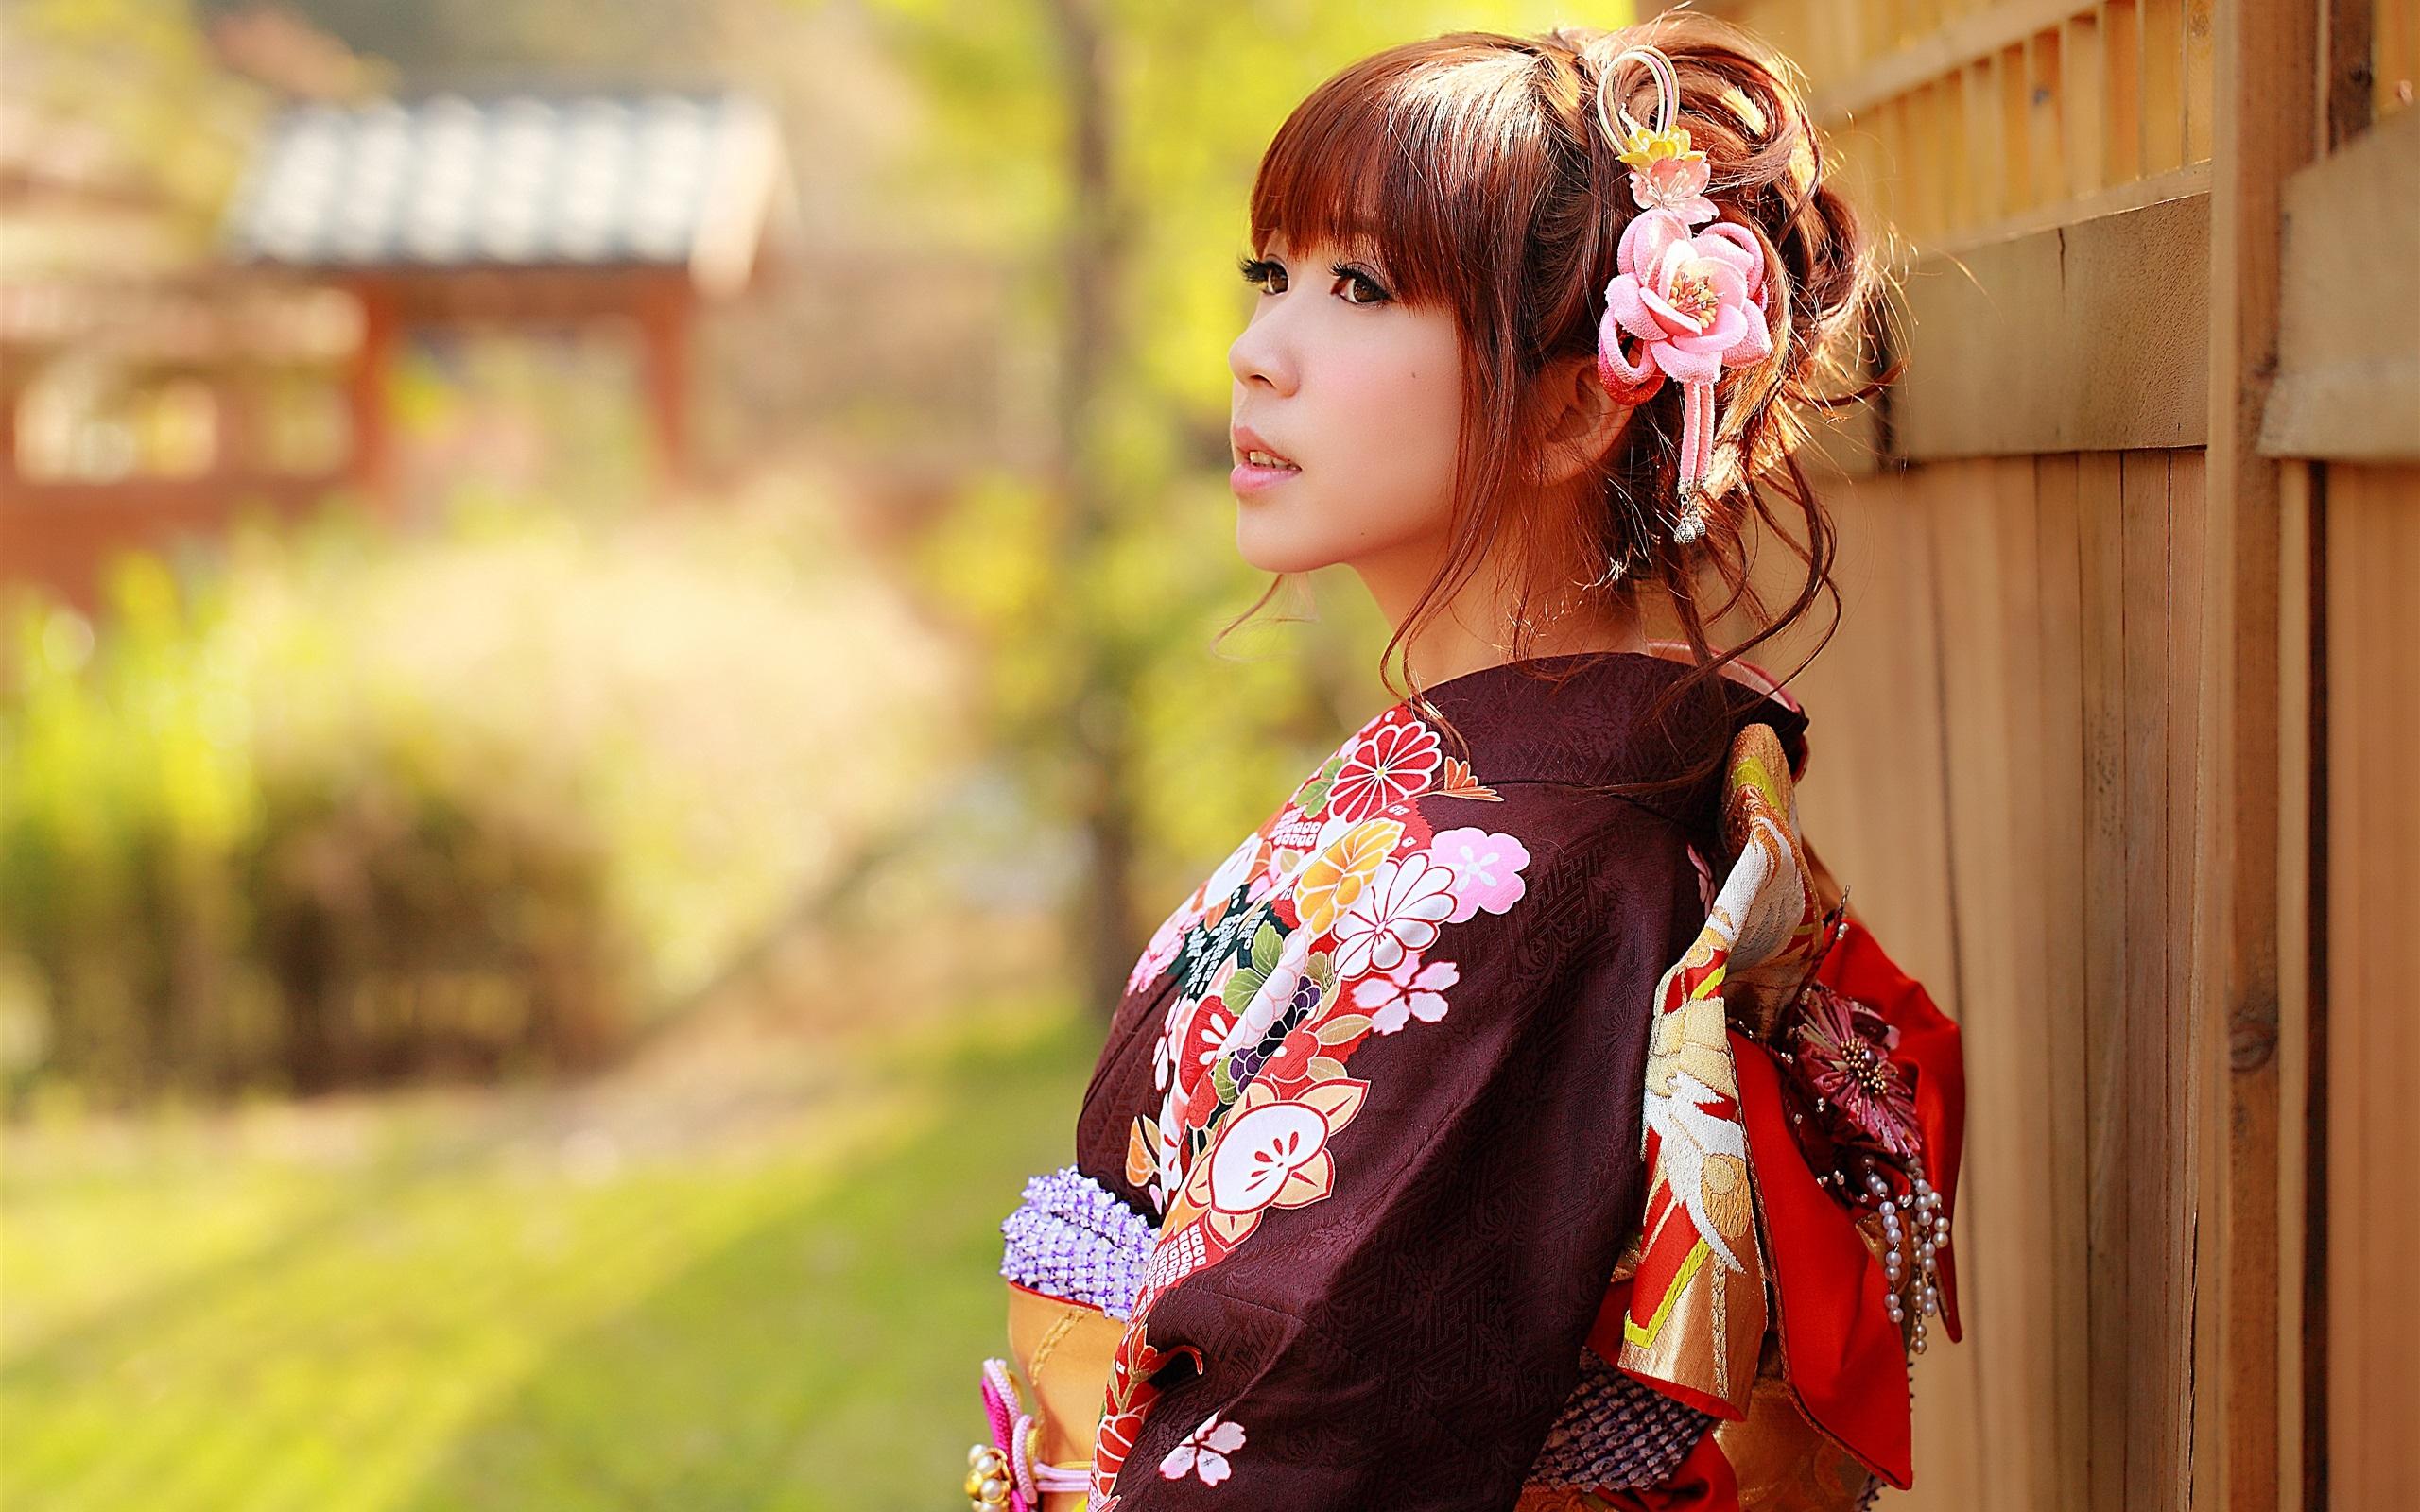 Wallpaper Japanese Girl Asian Kimono Clothes 2560x1600 Hd Picture